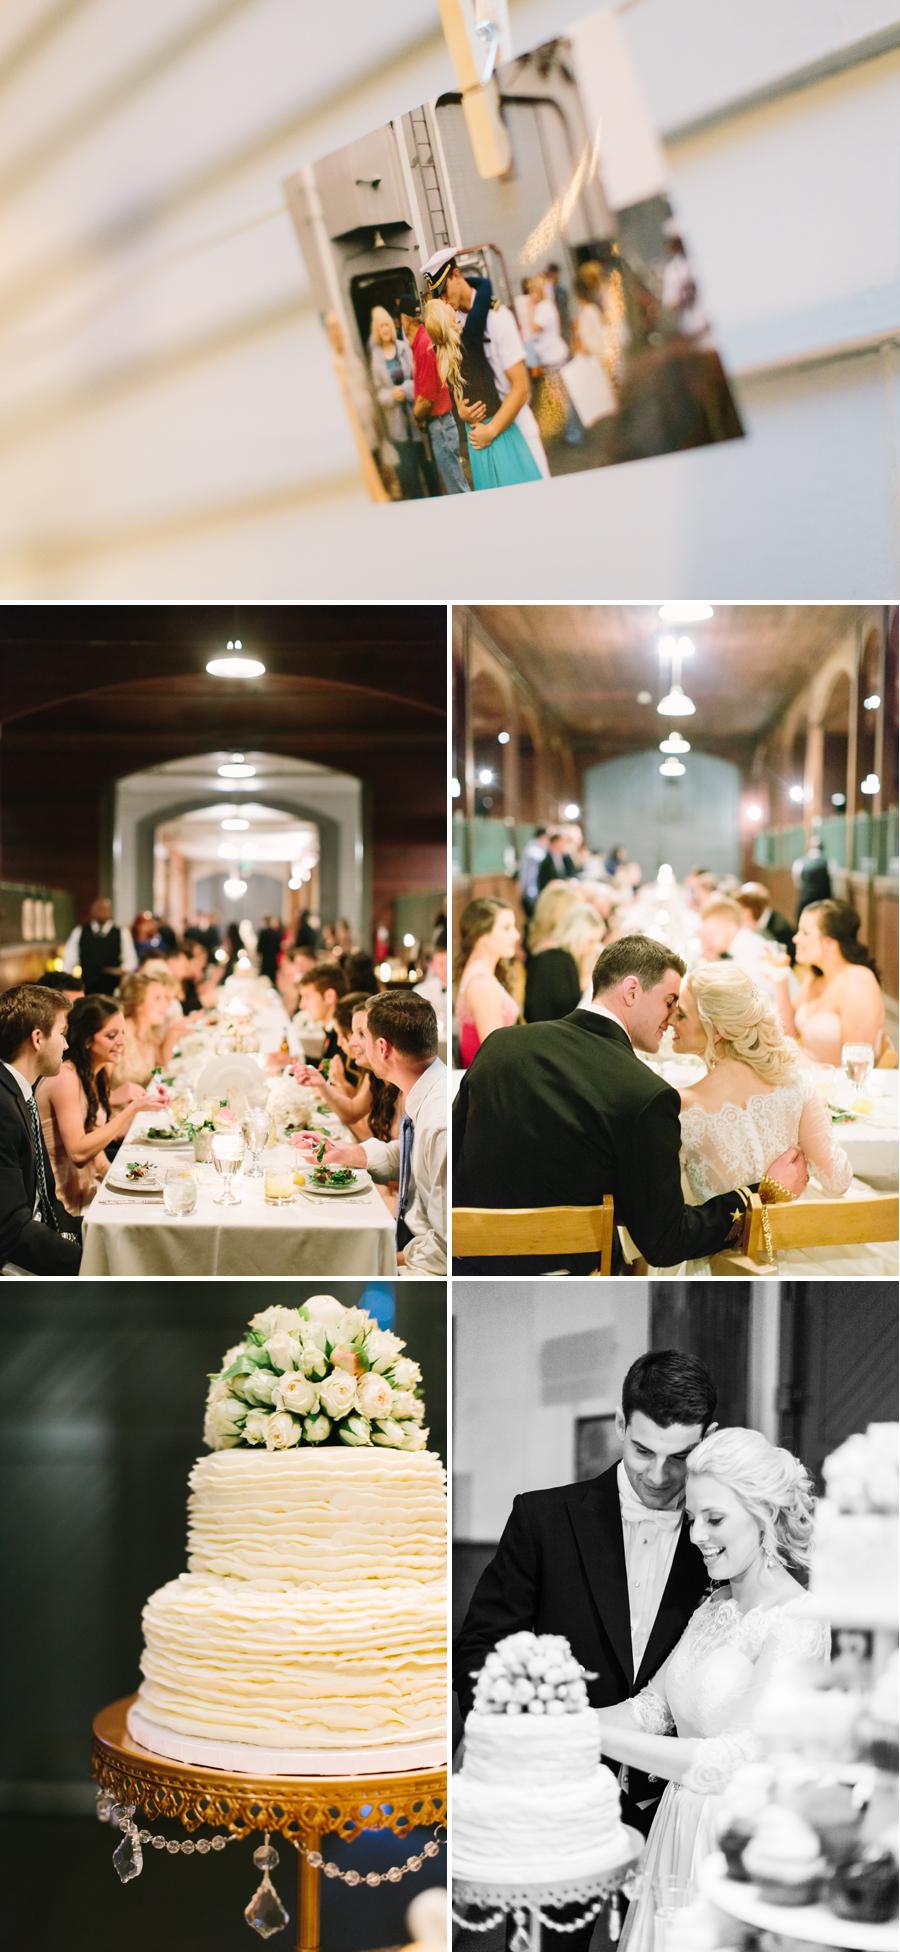 Nashville_Wedding_Photographer_Rachel_Moore_9.jpg